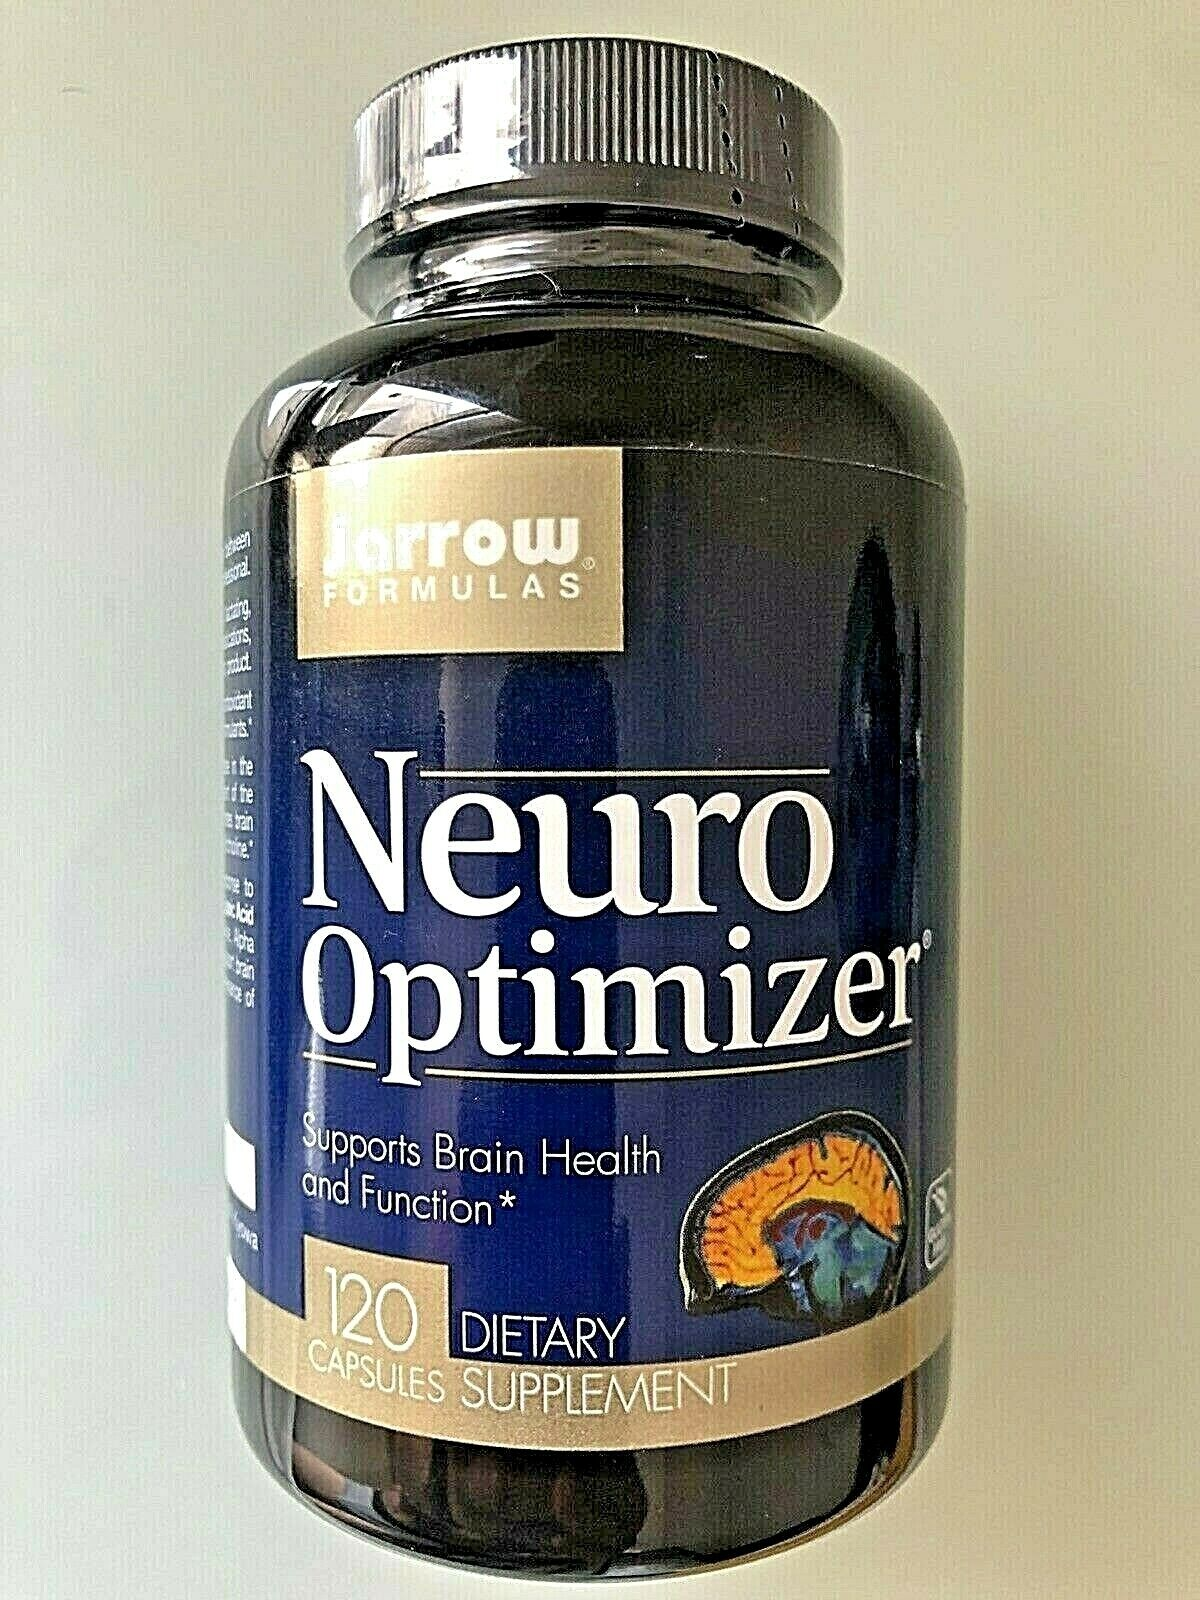 Jarrow Formulas: NEURO OPTIMIZER (120 Ct) | SUPPORTS: BRAIN HEALTH & FUNCTION